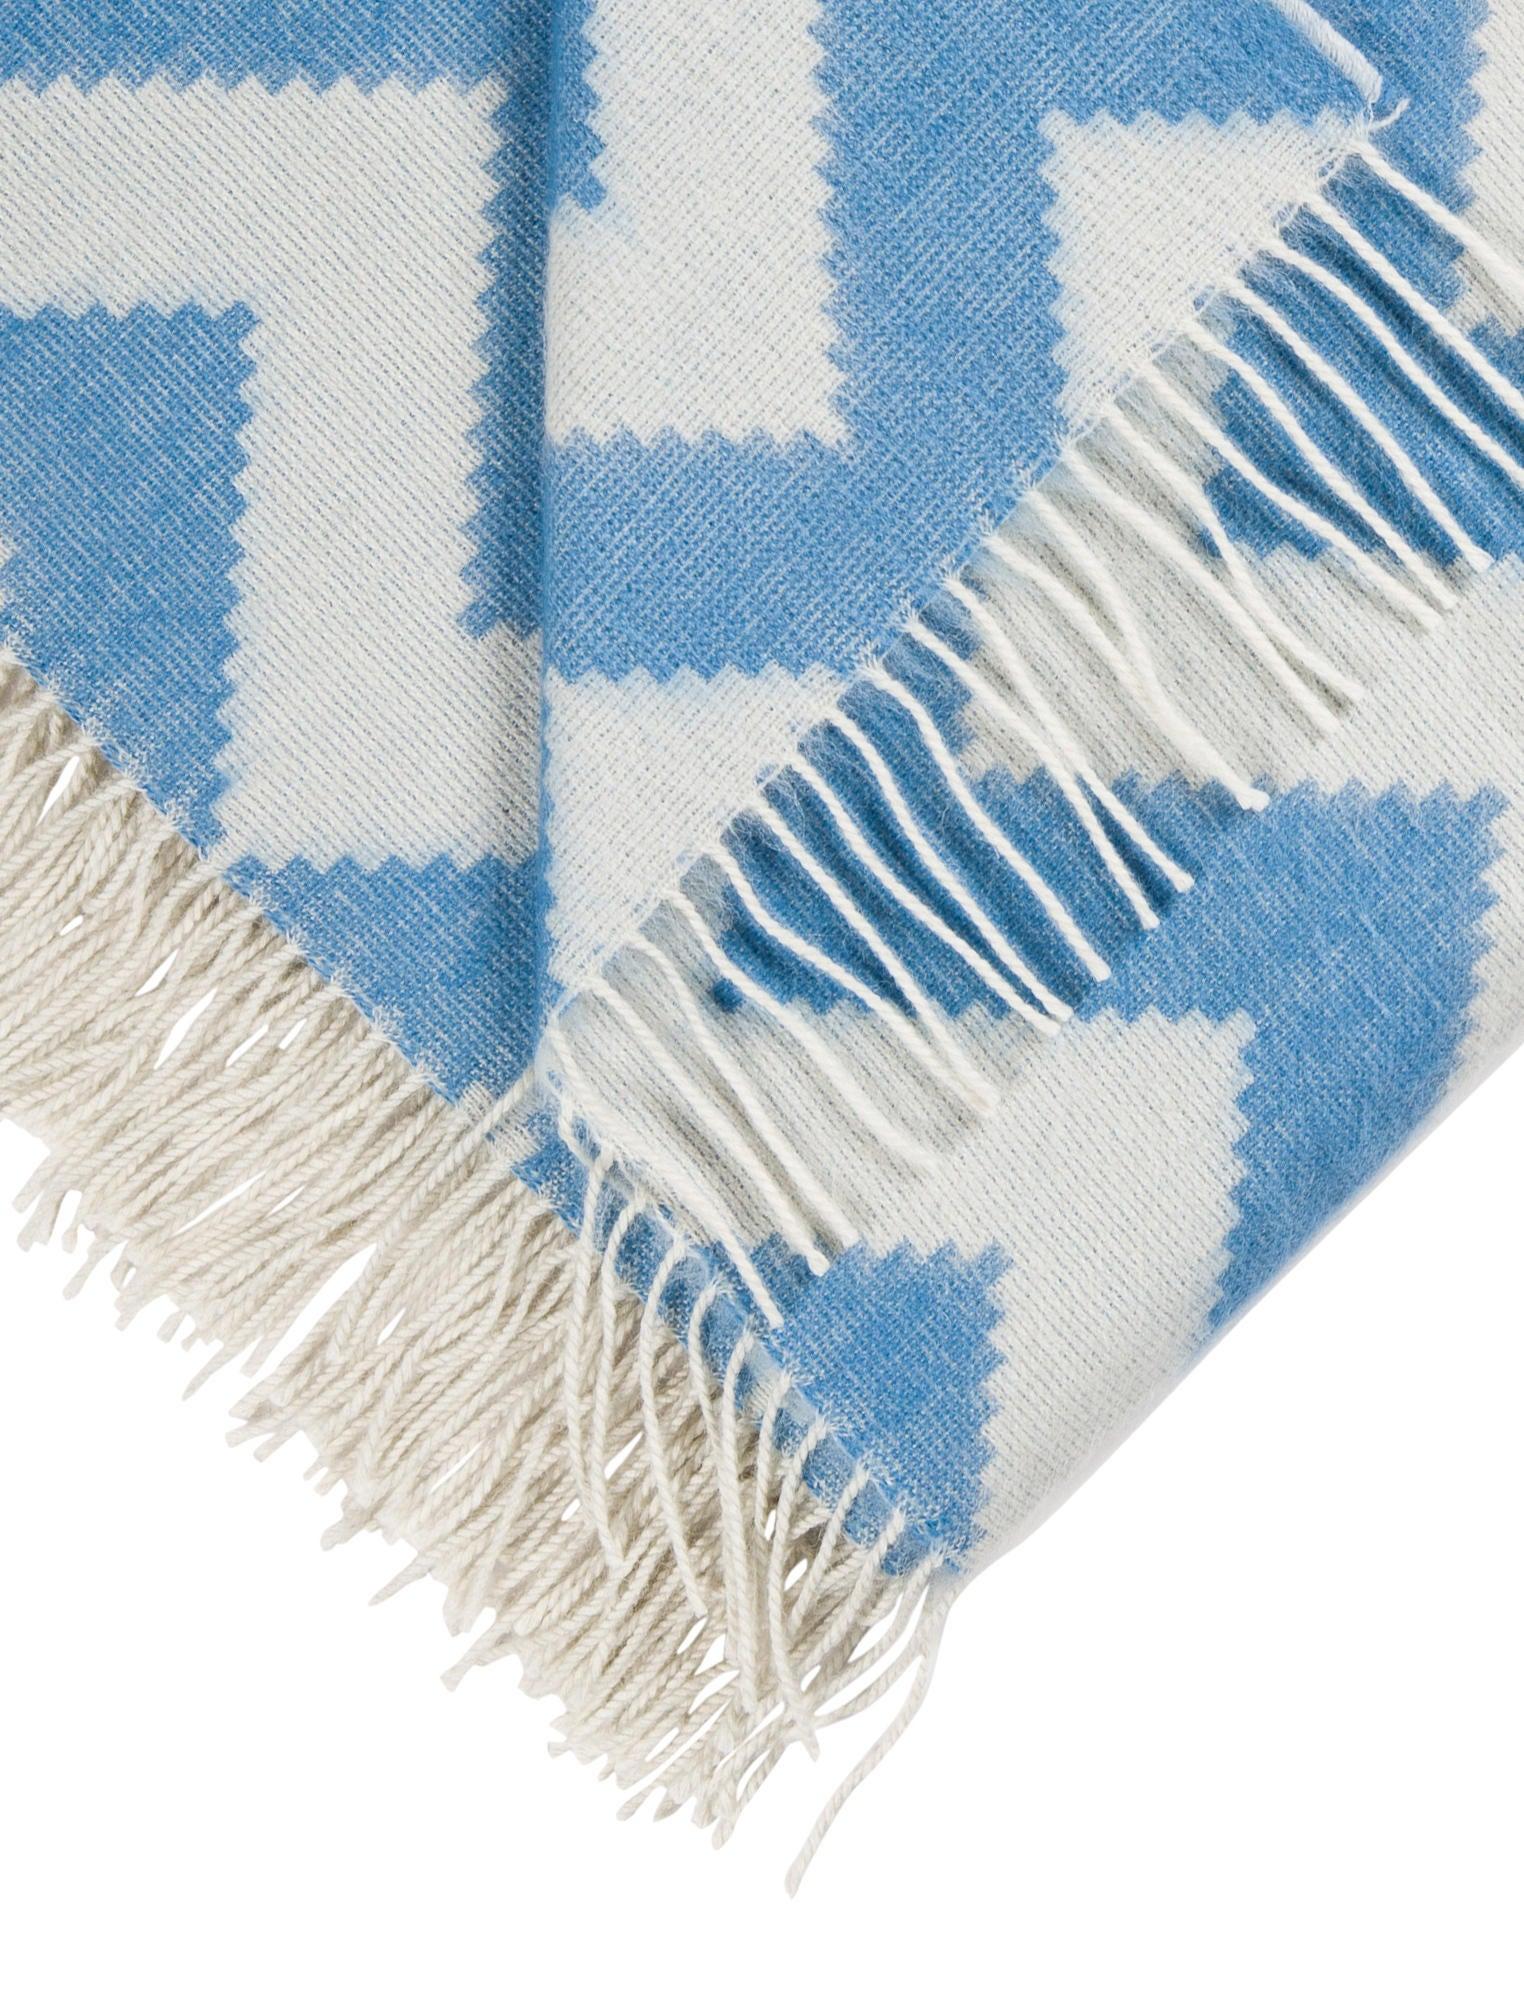 Jonathan Adler Zig Zag Throw Blanket w/ Tags - Pillows And Throws - JTADL20960 The RealReal